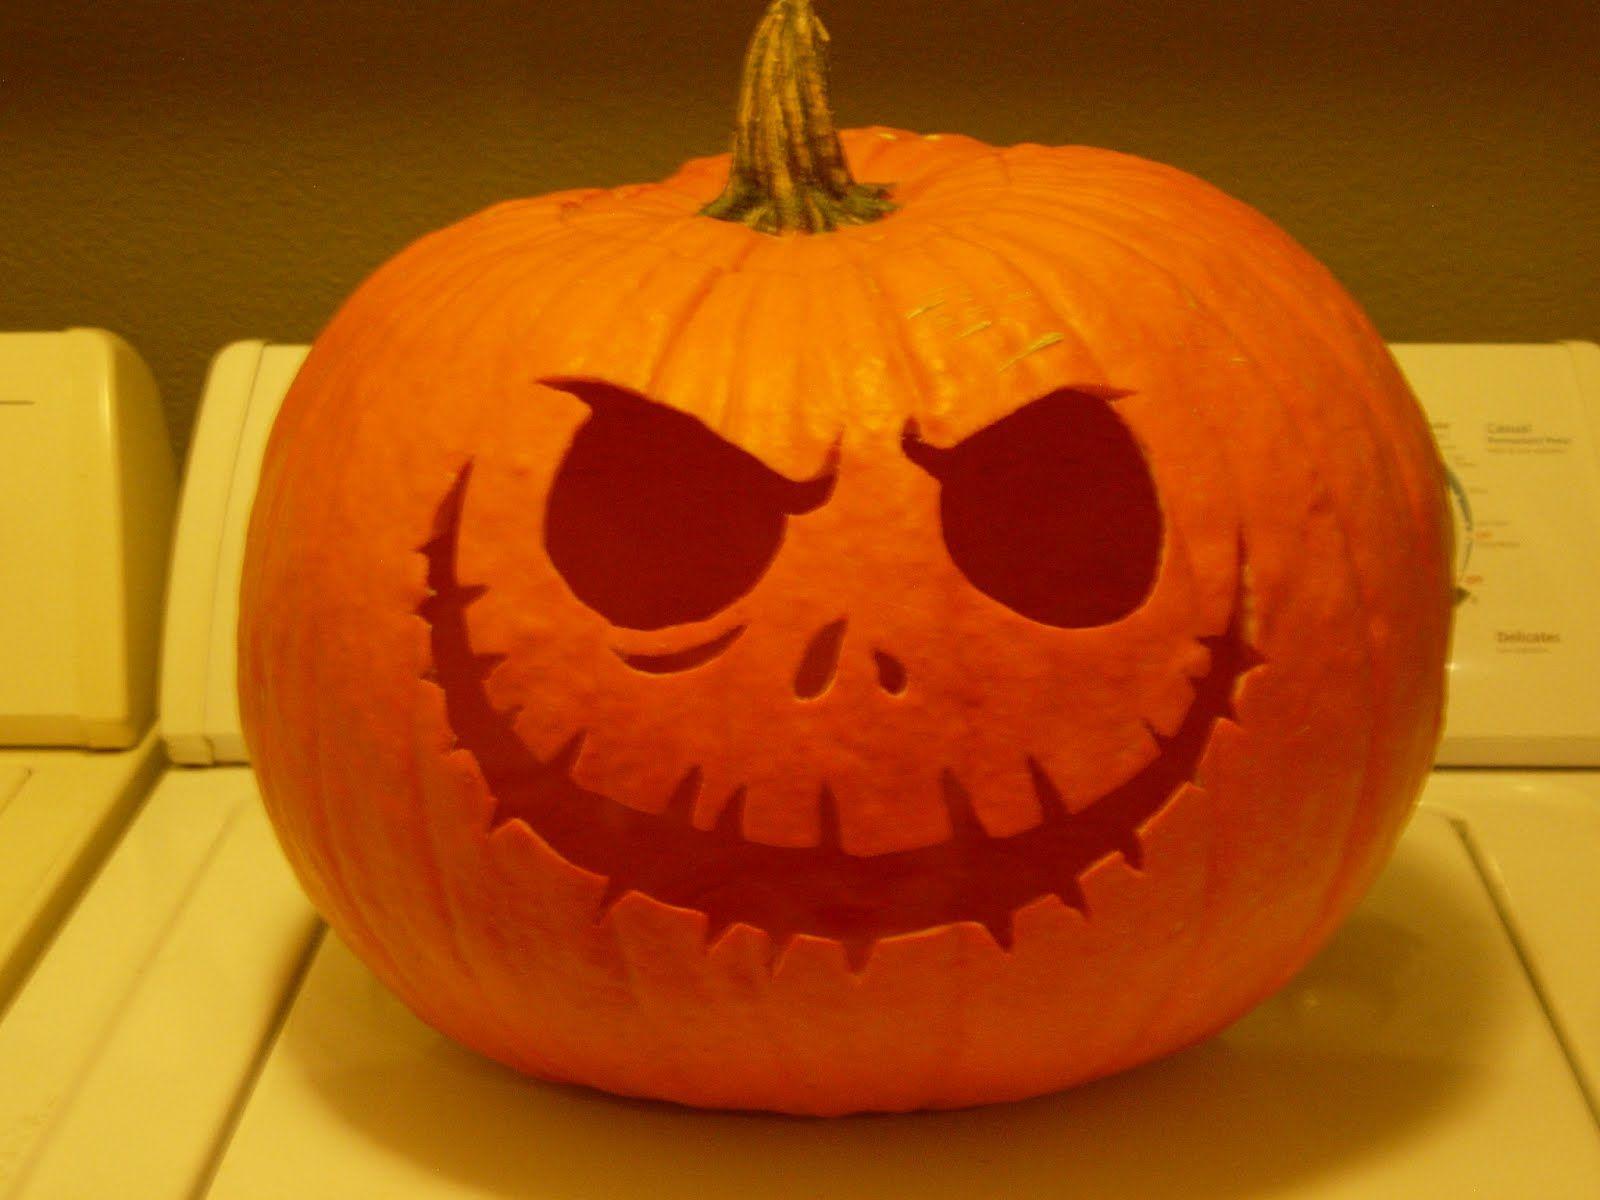 Boogeyman Nightmare Before Christmas Pumpkin Carving | Christmaswalls.co